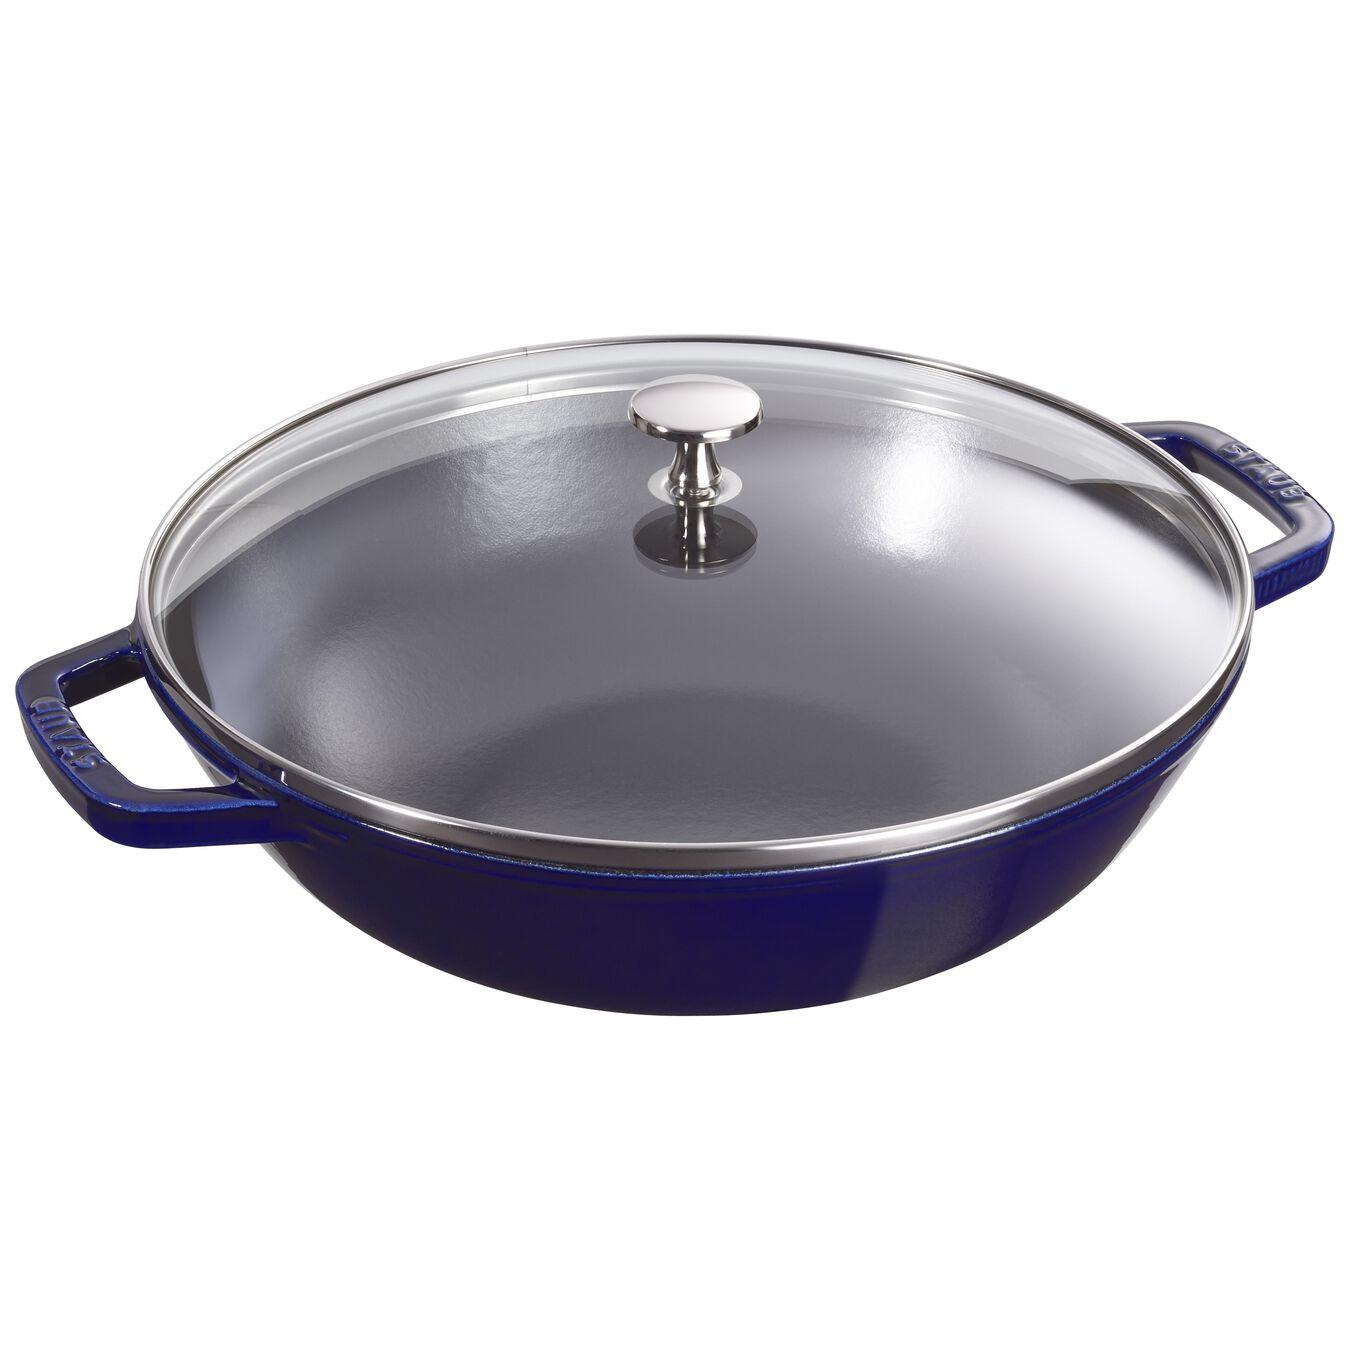 4.5 qt, Wok with glass lid, dark blue,,large 1